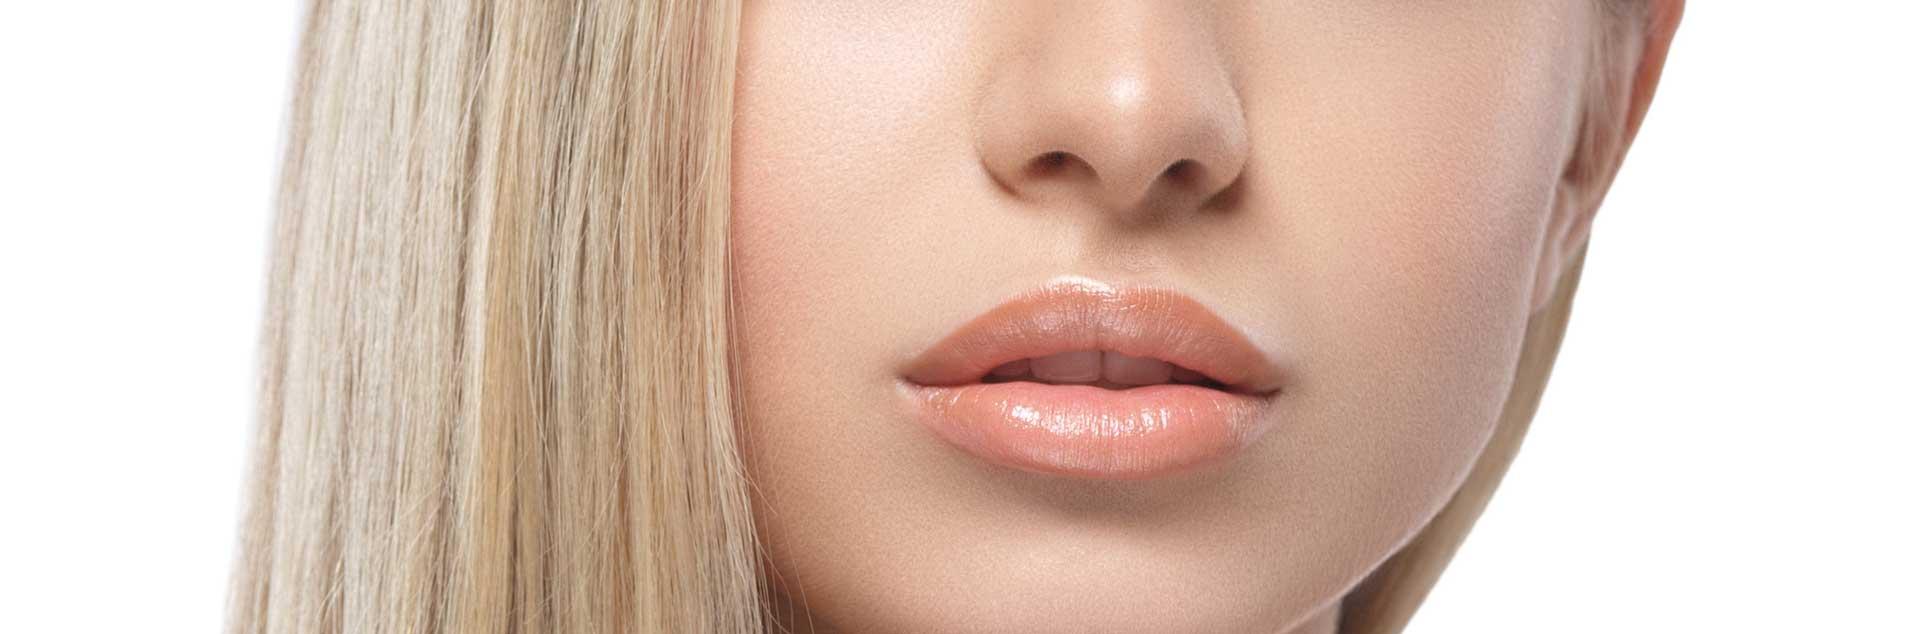 Lippen aufspritzen - Dr. Arco